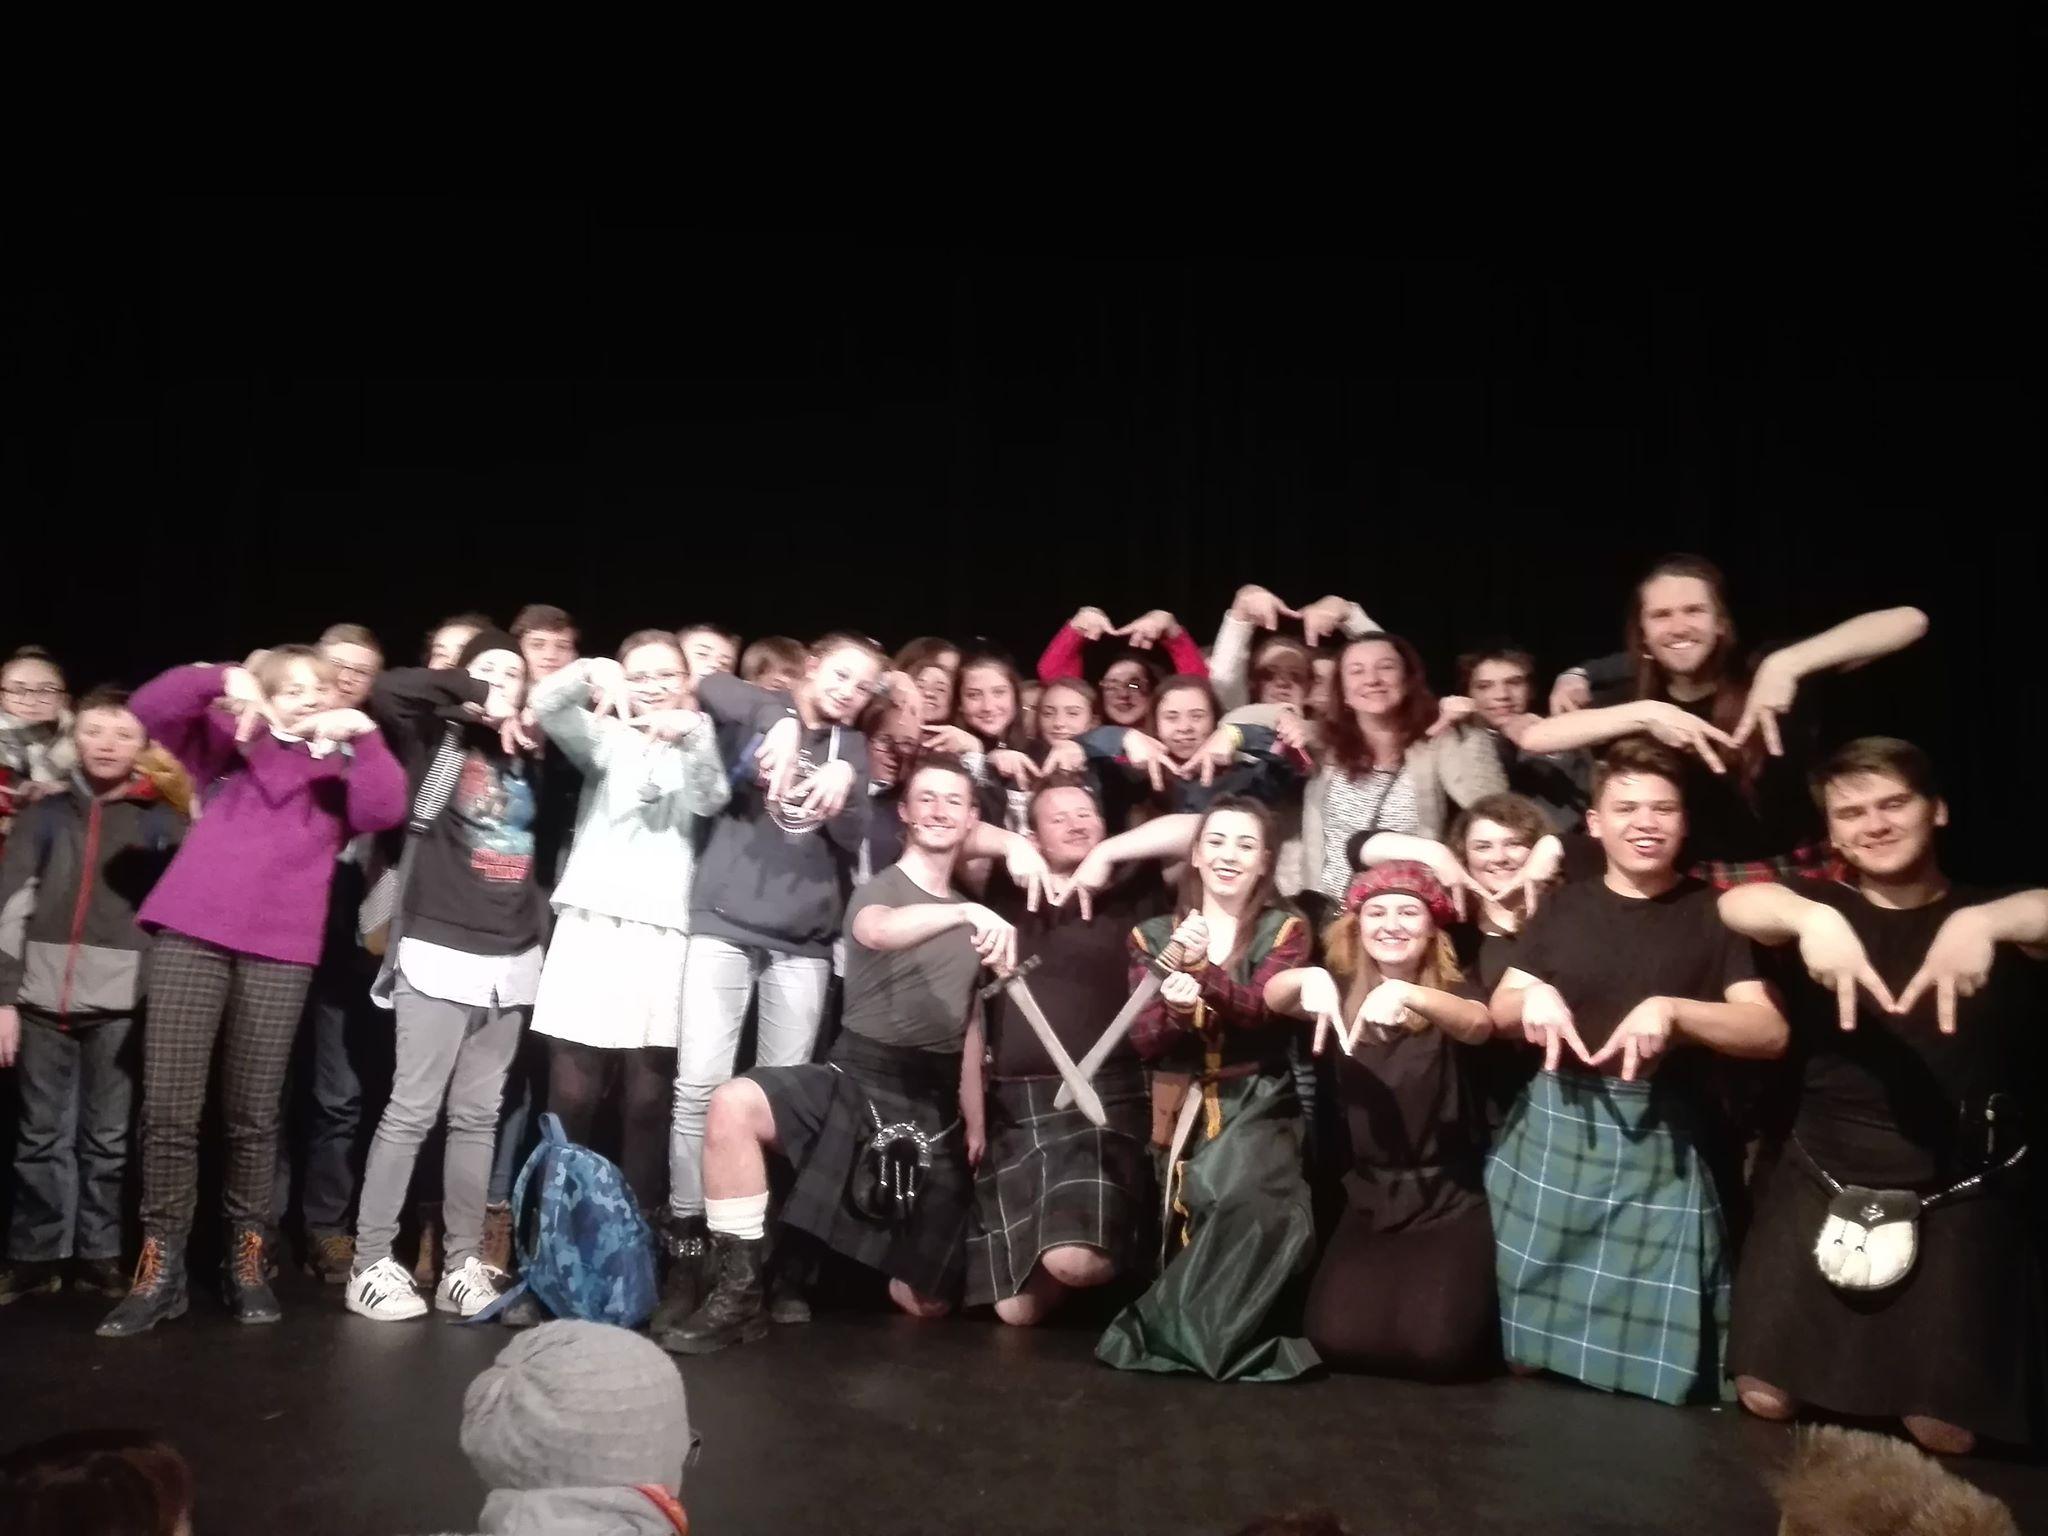 moracz theatre, CaptivateTheatre, BraveMacbeth,